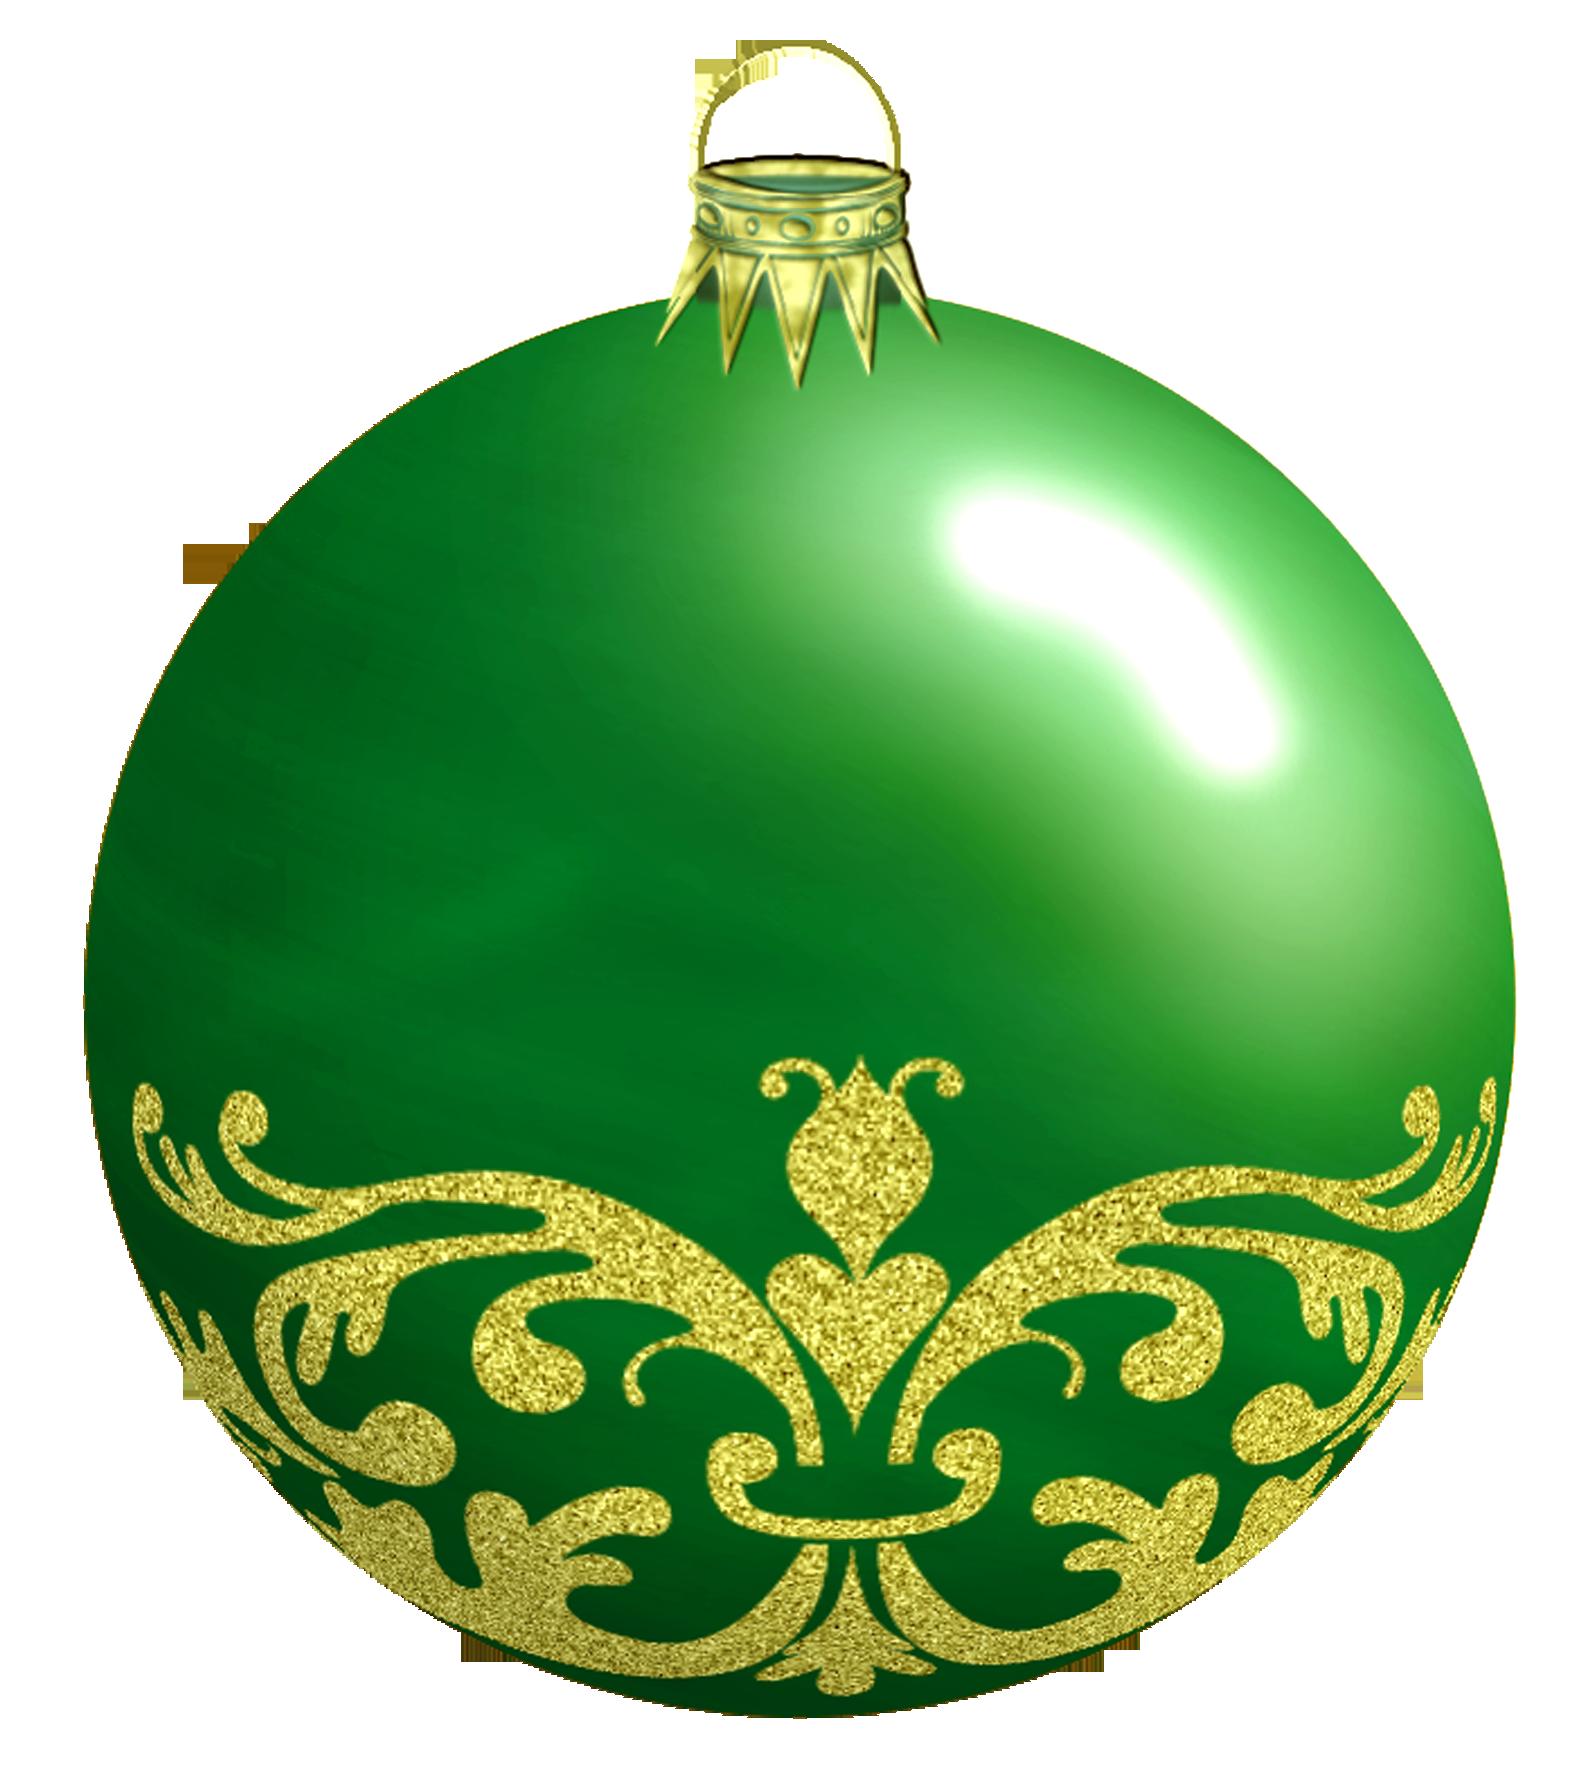 Decoration clipart bauble. Christmas png image purepng